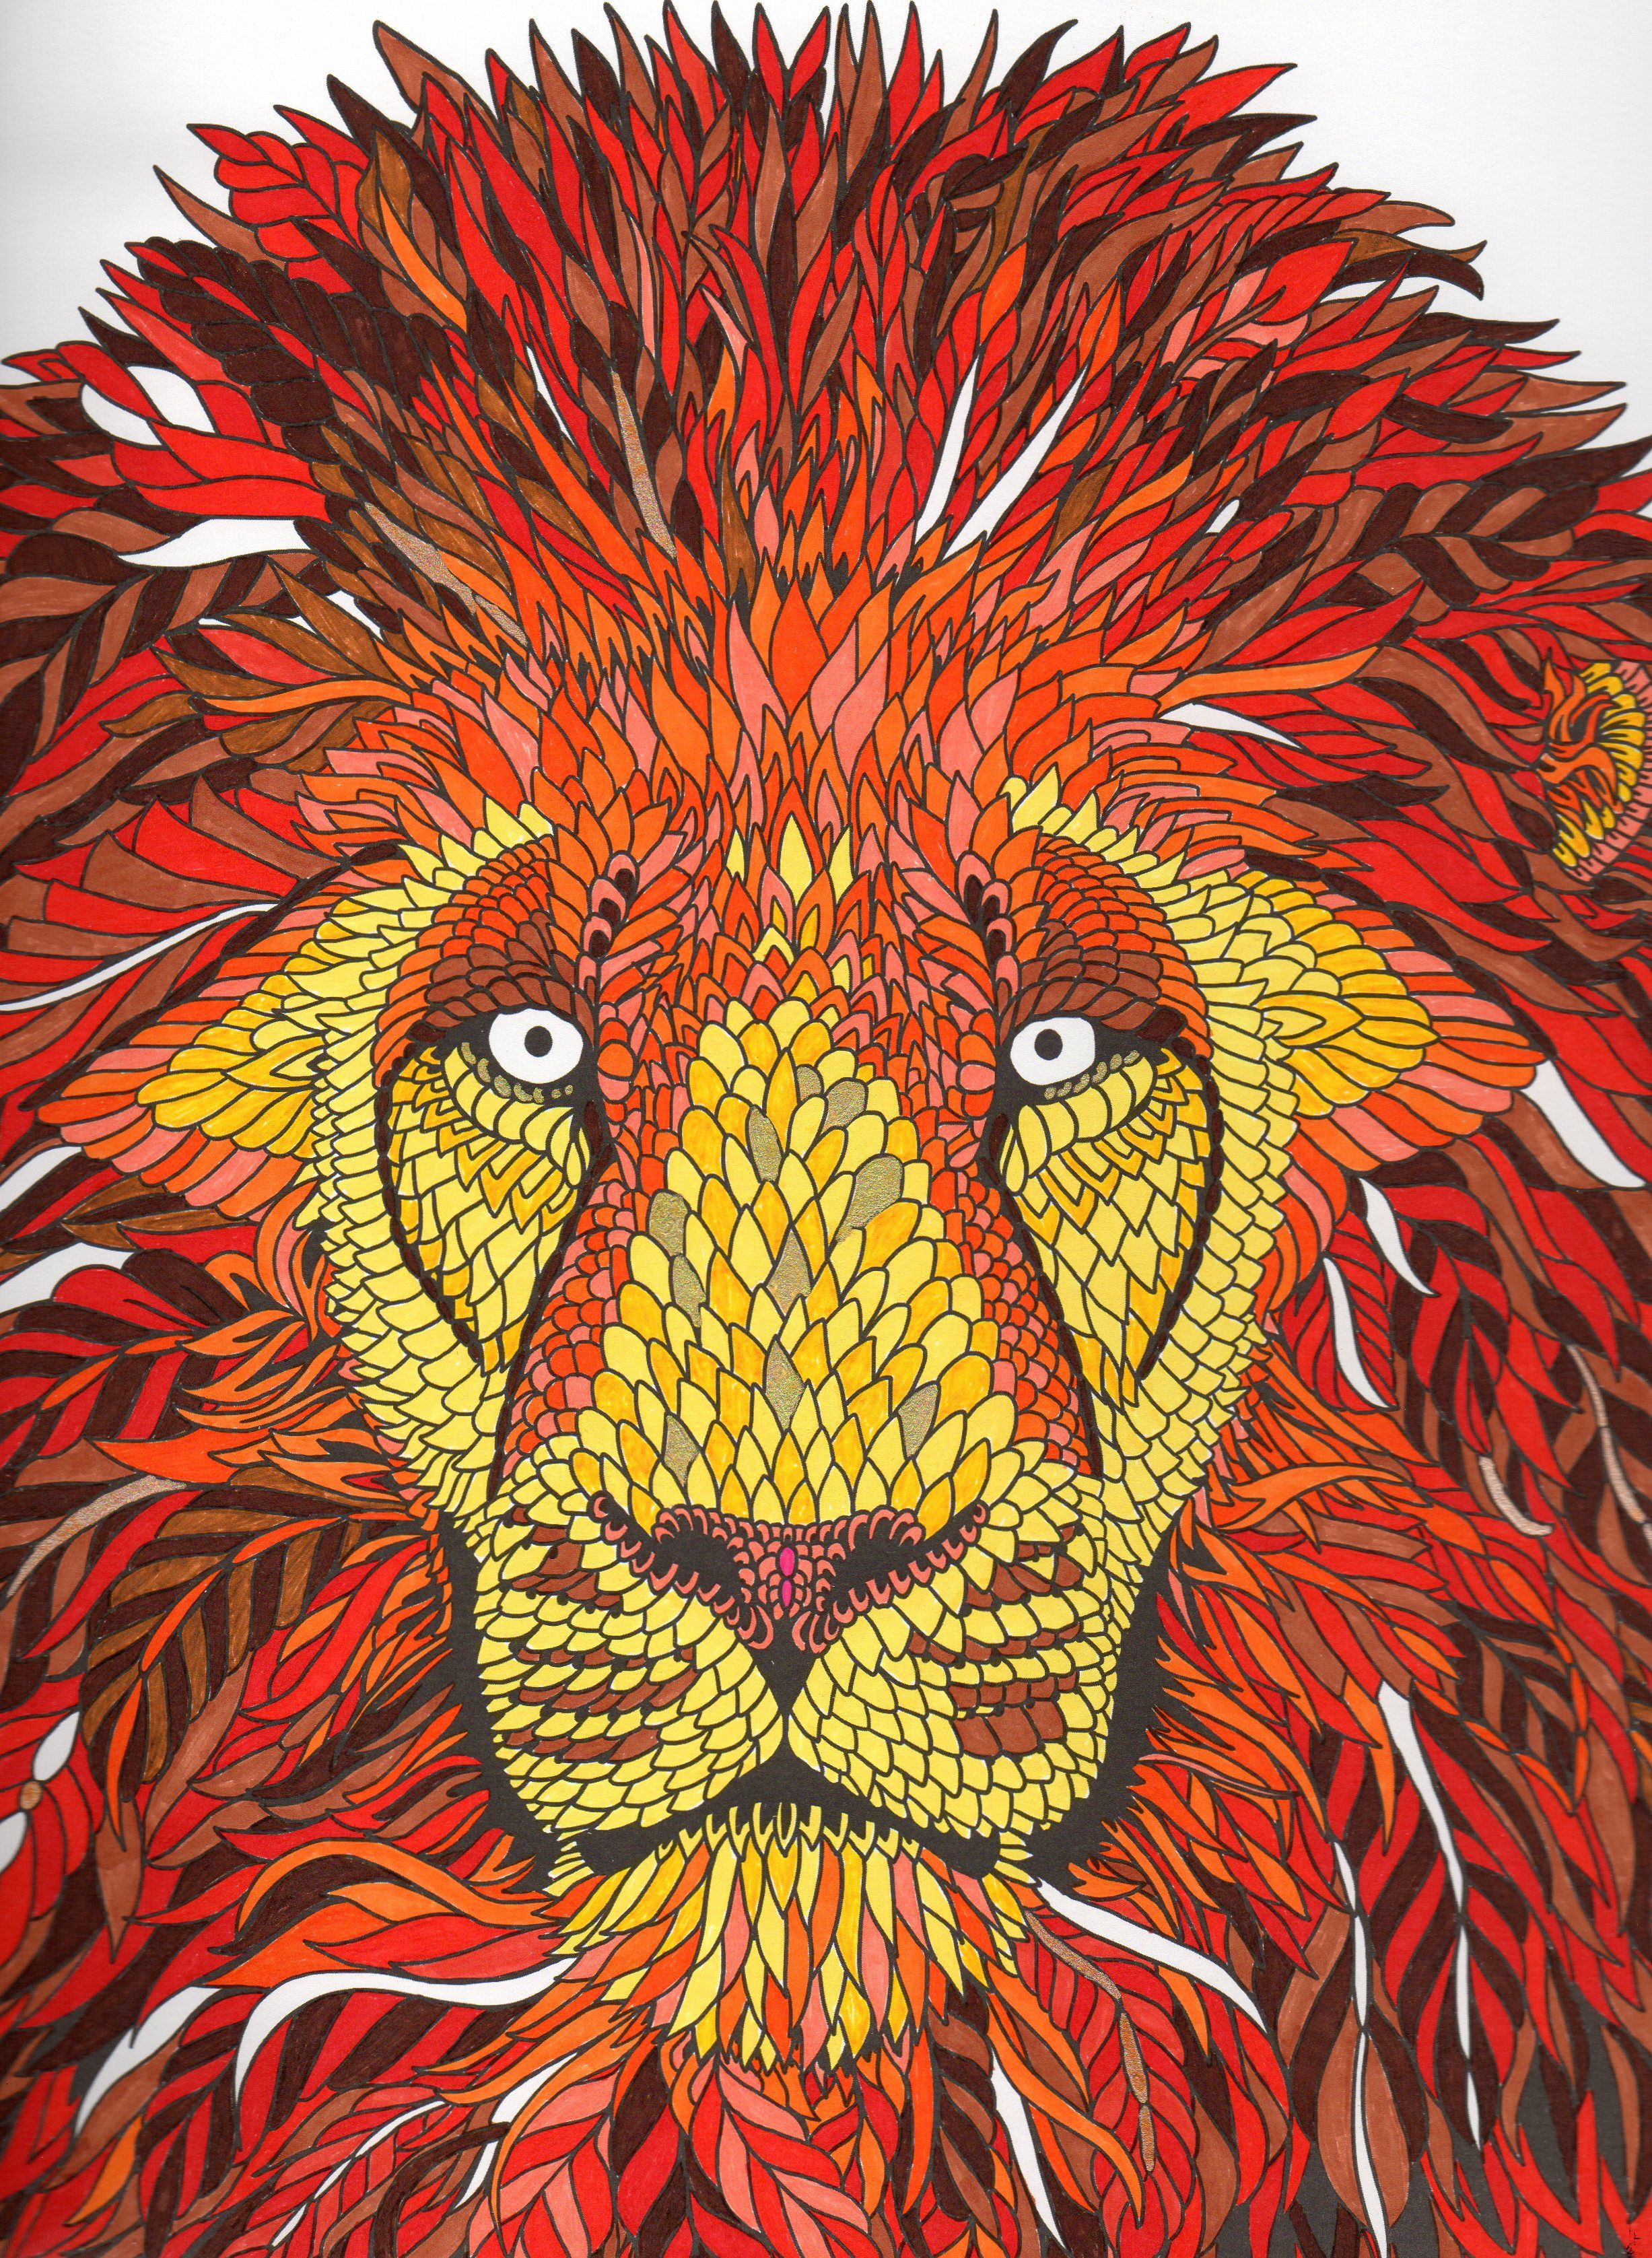 Mon Lion La Menagerie The Menagerie Colouring Book Coloriage Dessin